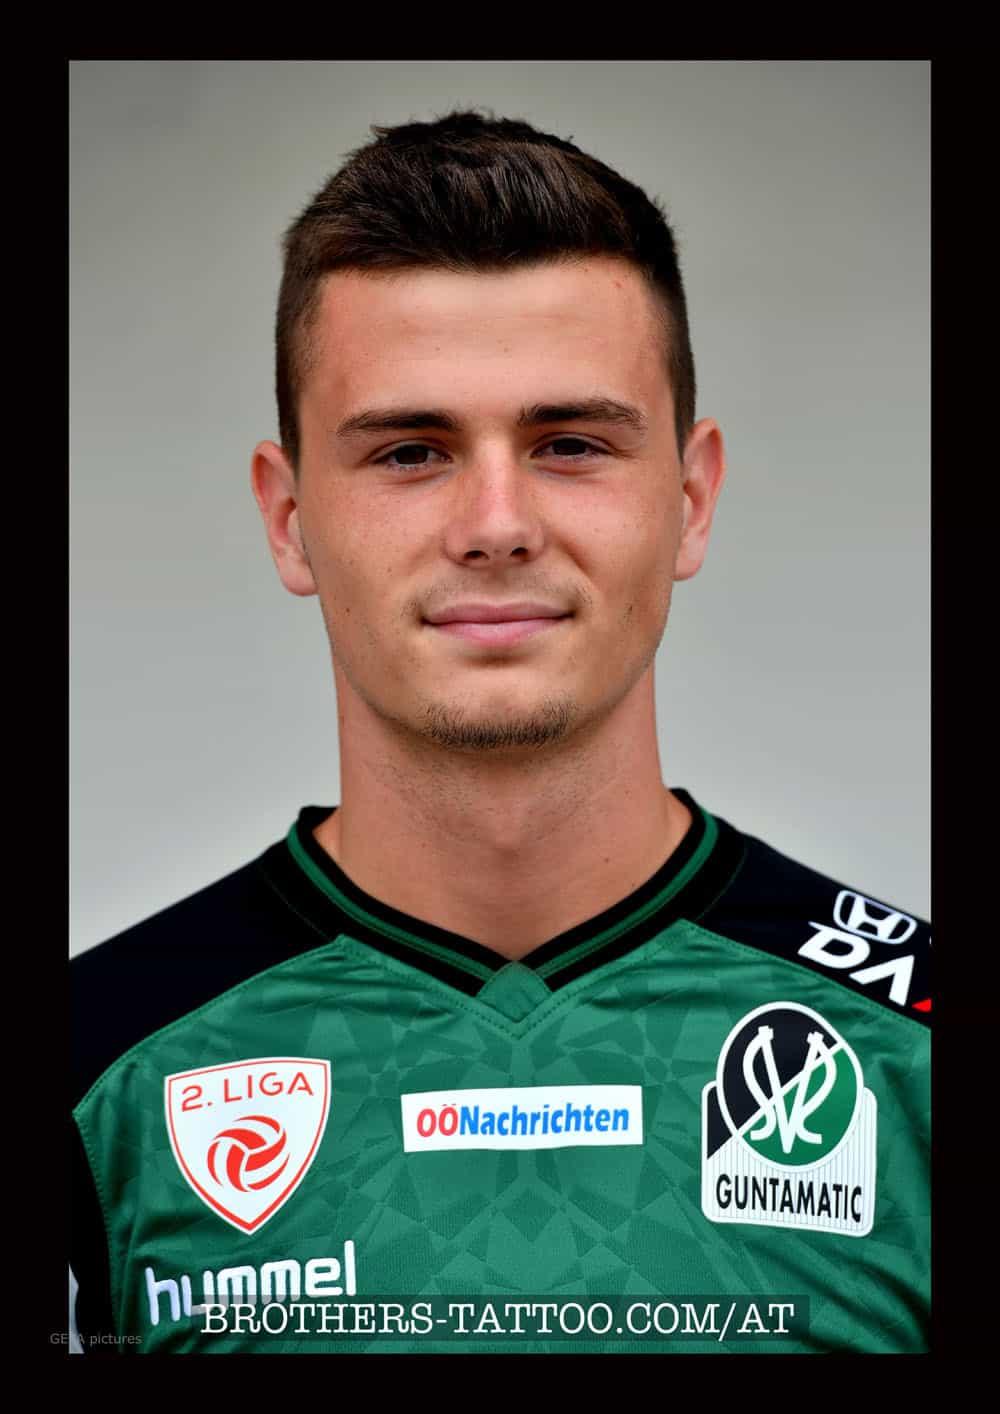 offizielles Sportlerfoto vom Fussballer Bojan Lugonja